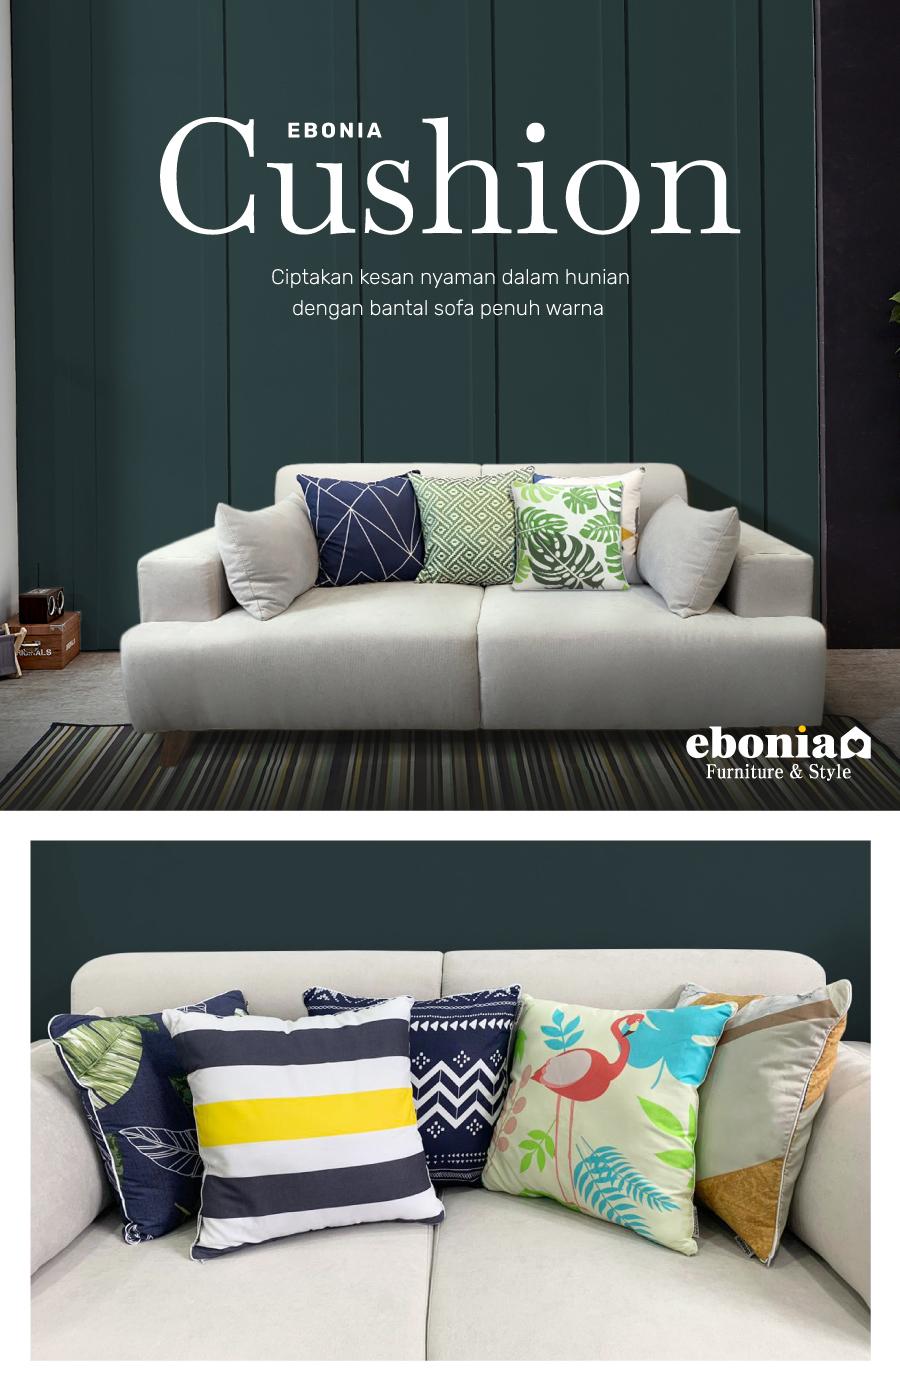 cushion_intro.jpg